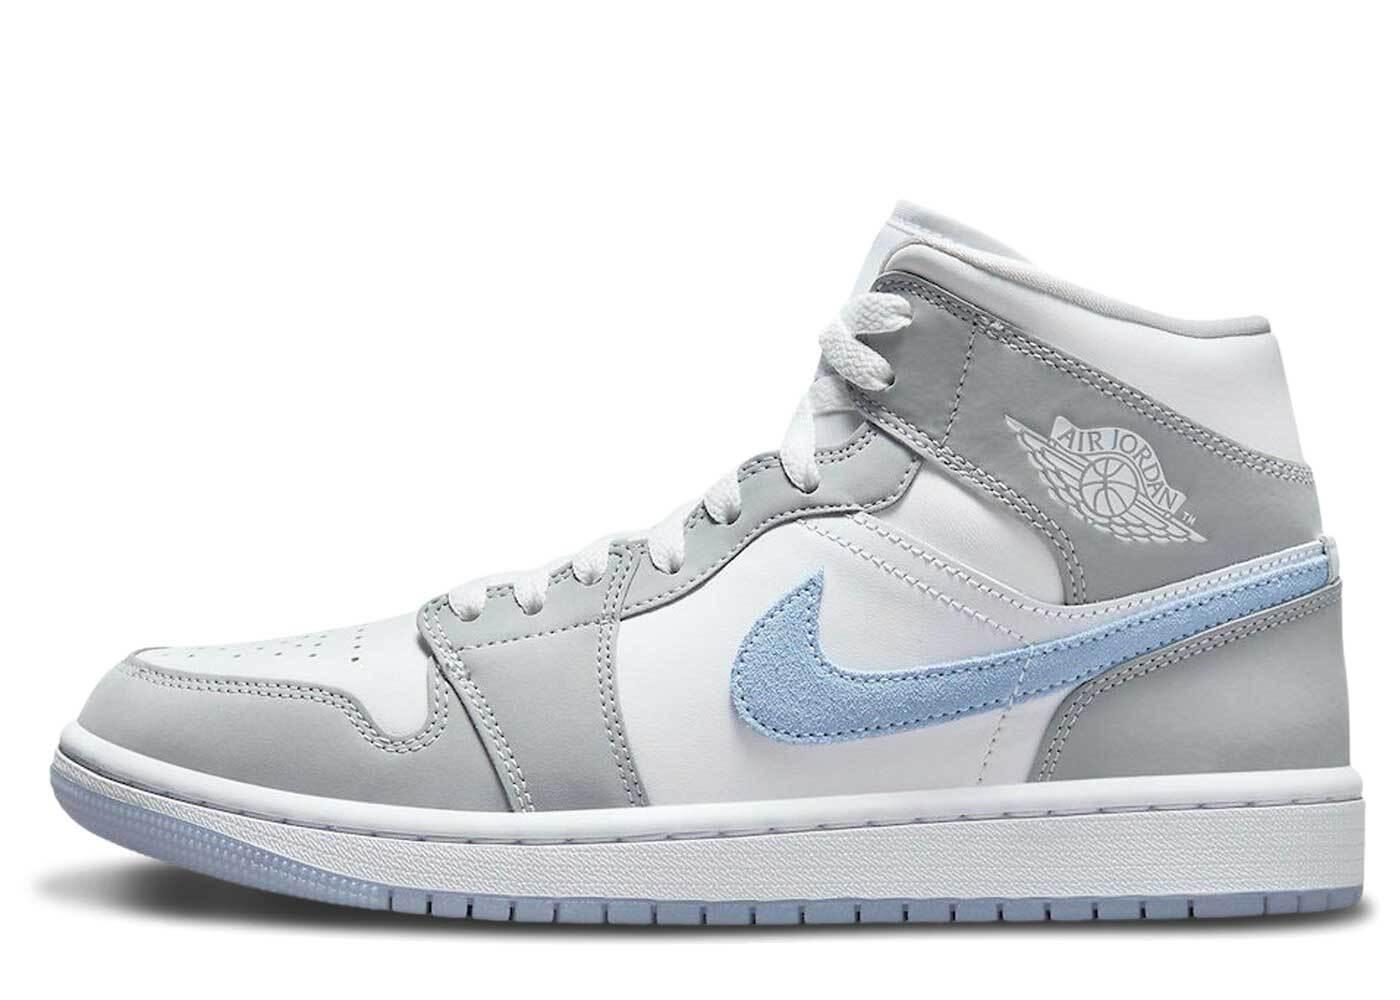 Nike Air Jordan 1 Mid White Grey Blue Womensの写真